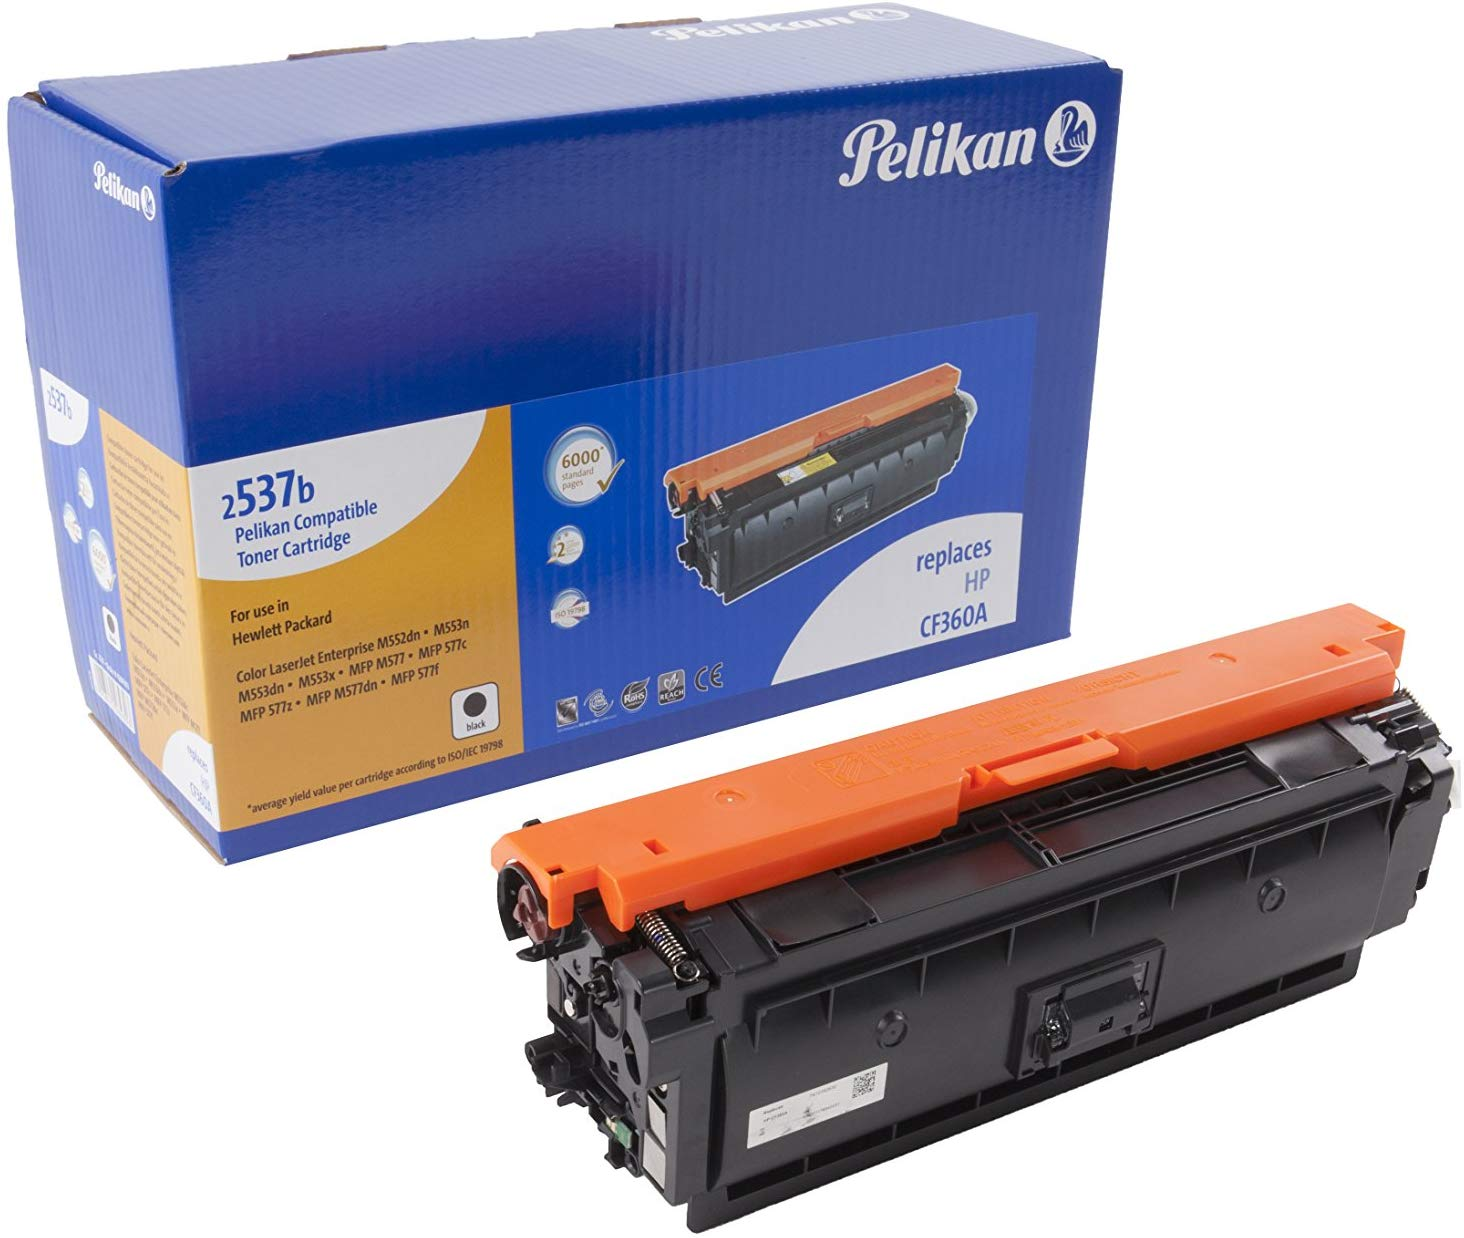 Pelikan Toner ersetzt HP CF360A, Black, 6000 Seiten